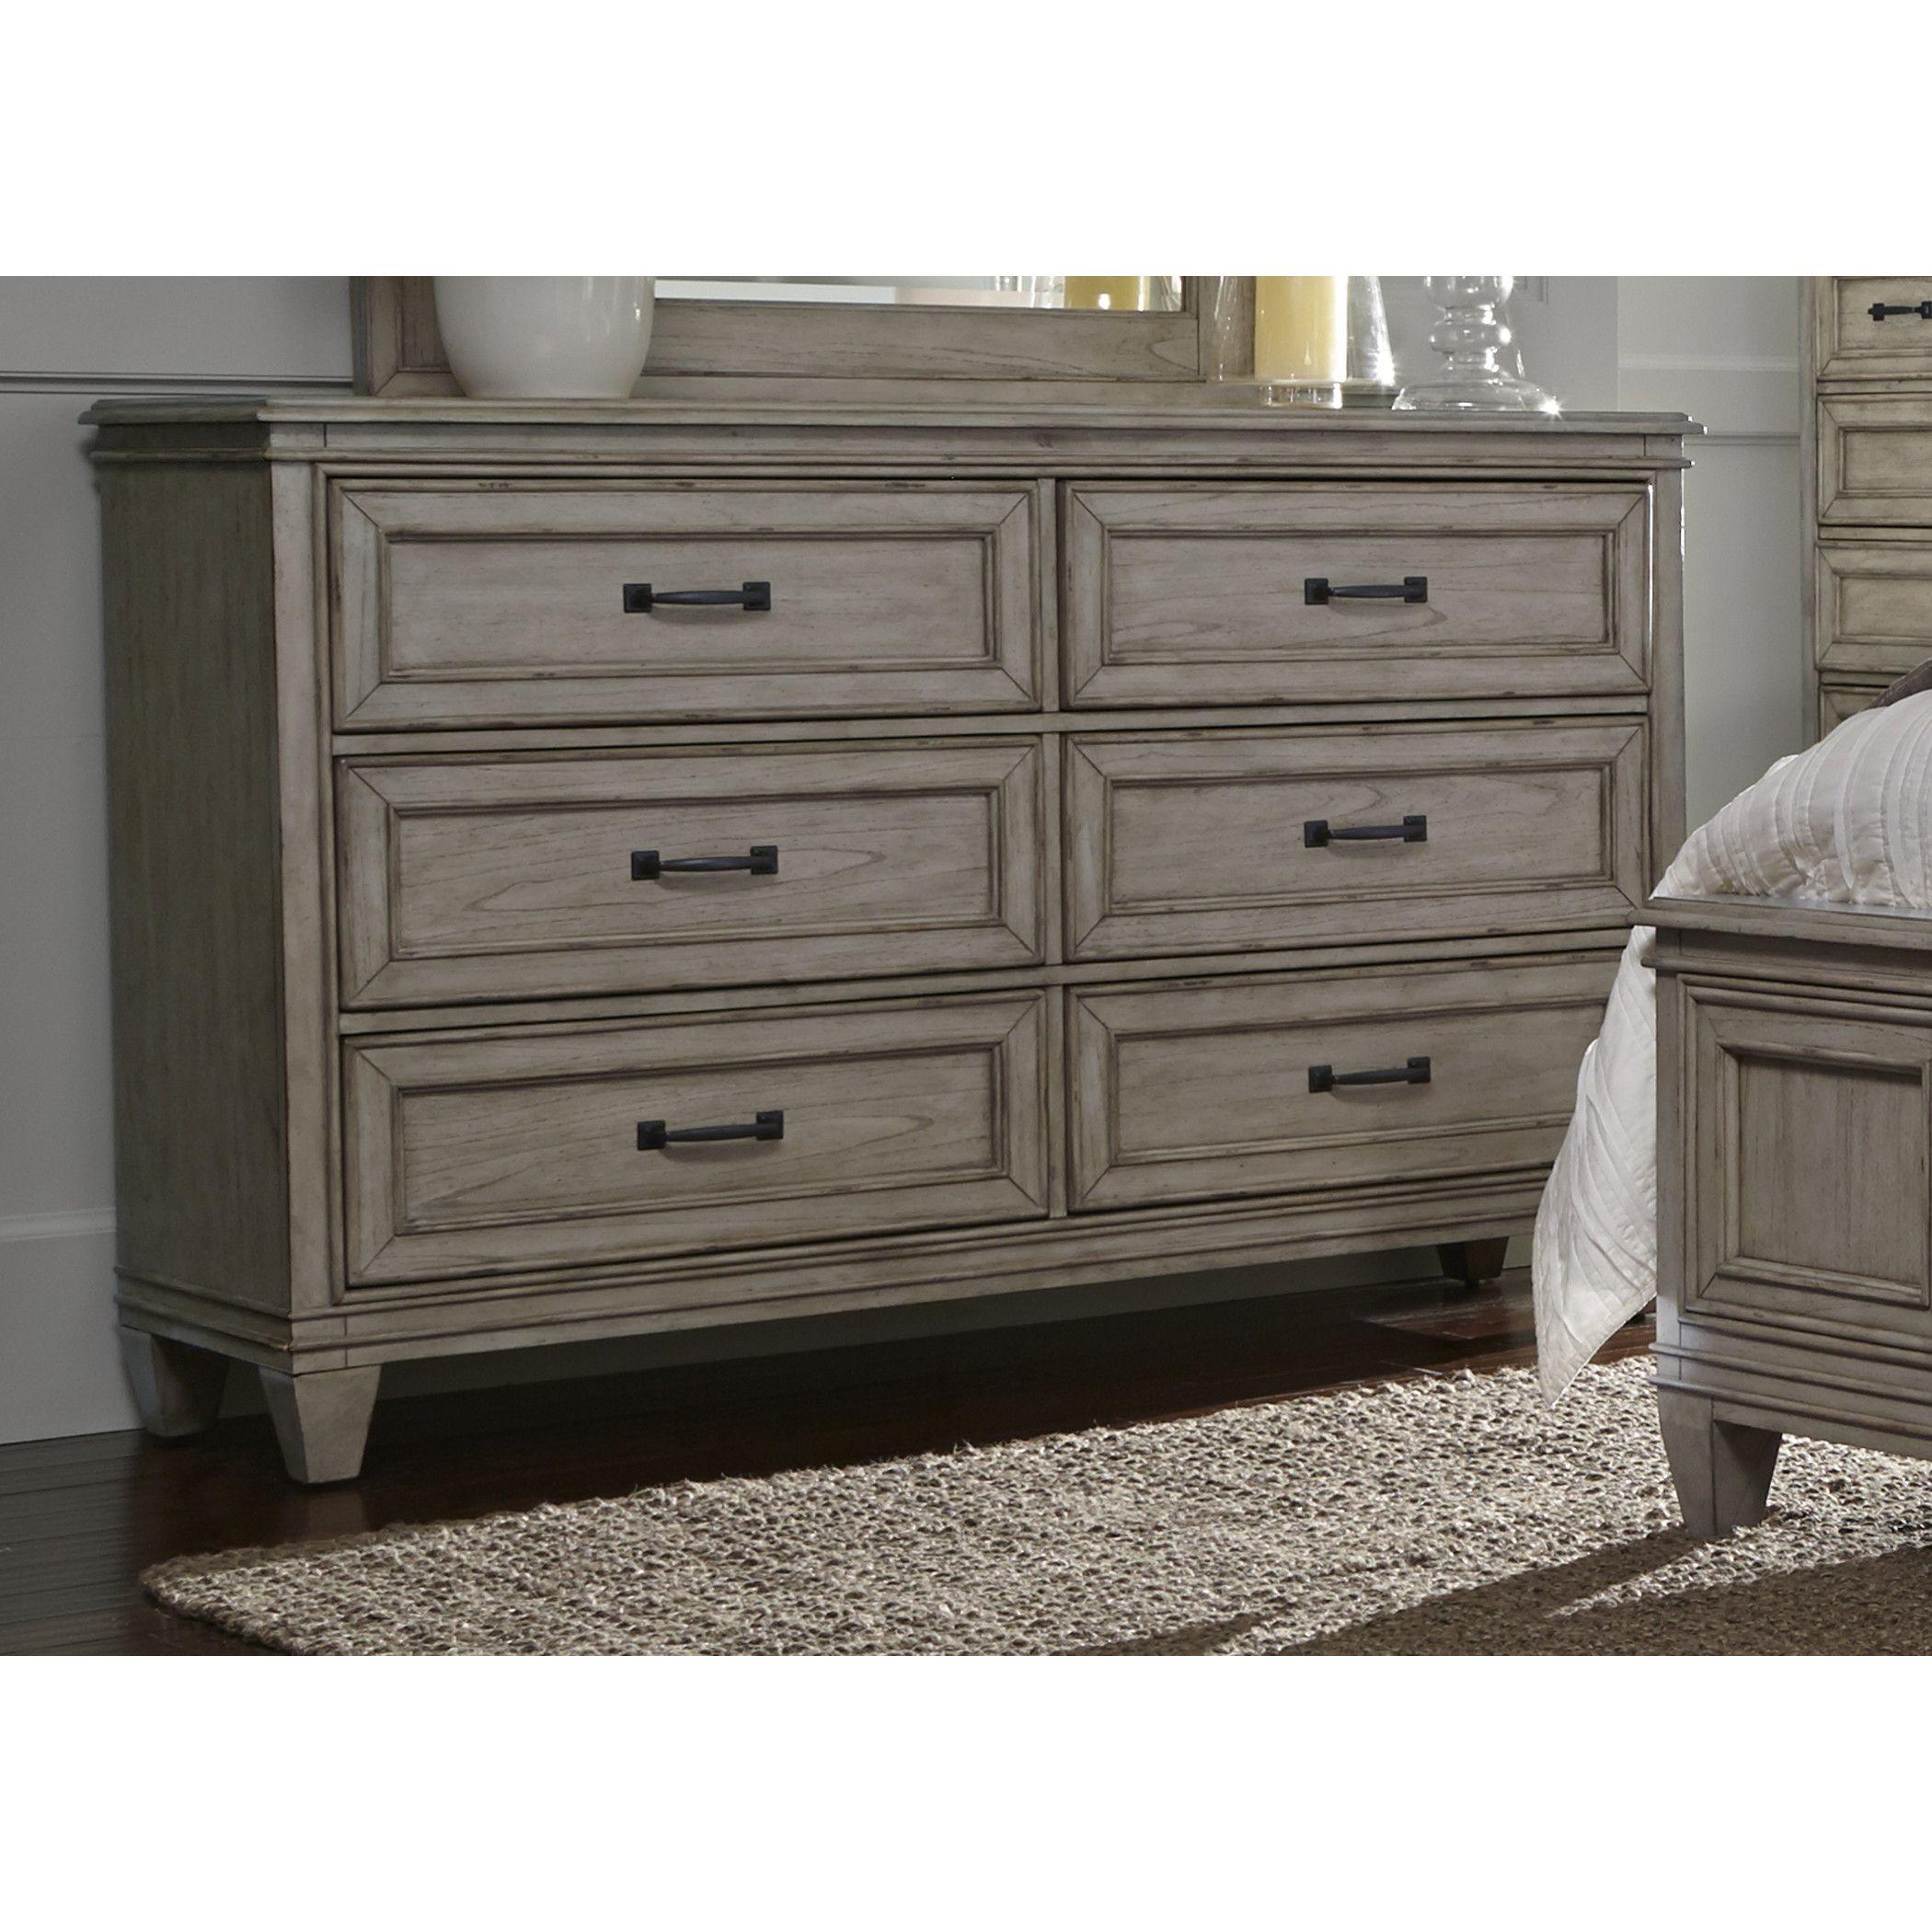 August Grove Grace 6 Drawer Dresser Dresser Furniture Traditional Furniture [ 2100 x 2100 Pixel ]